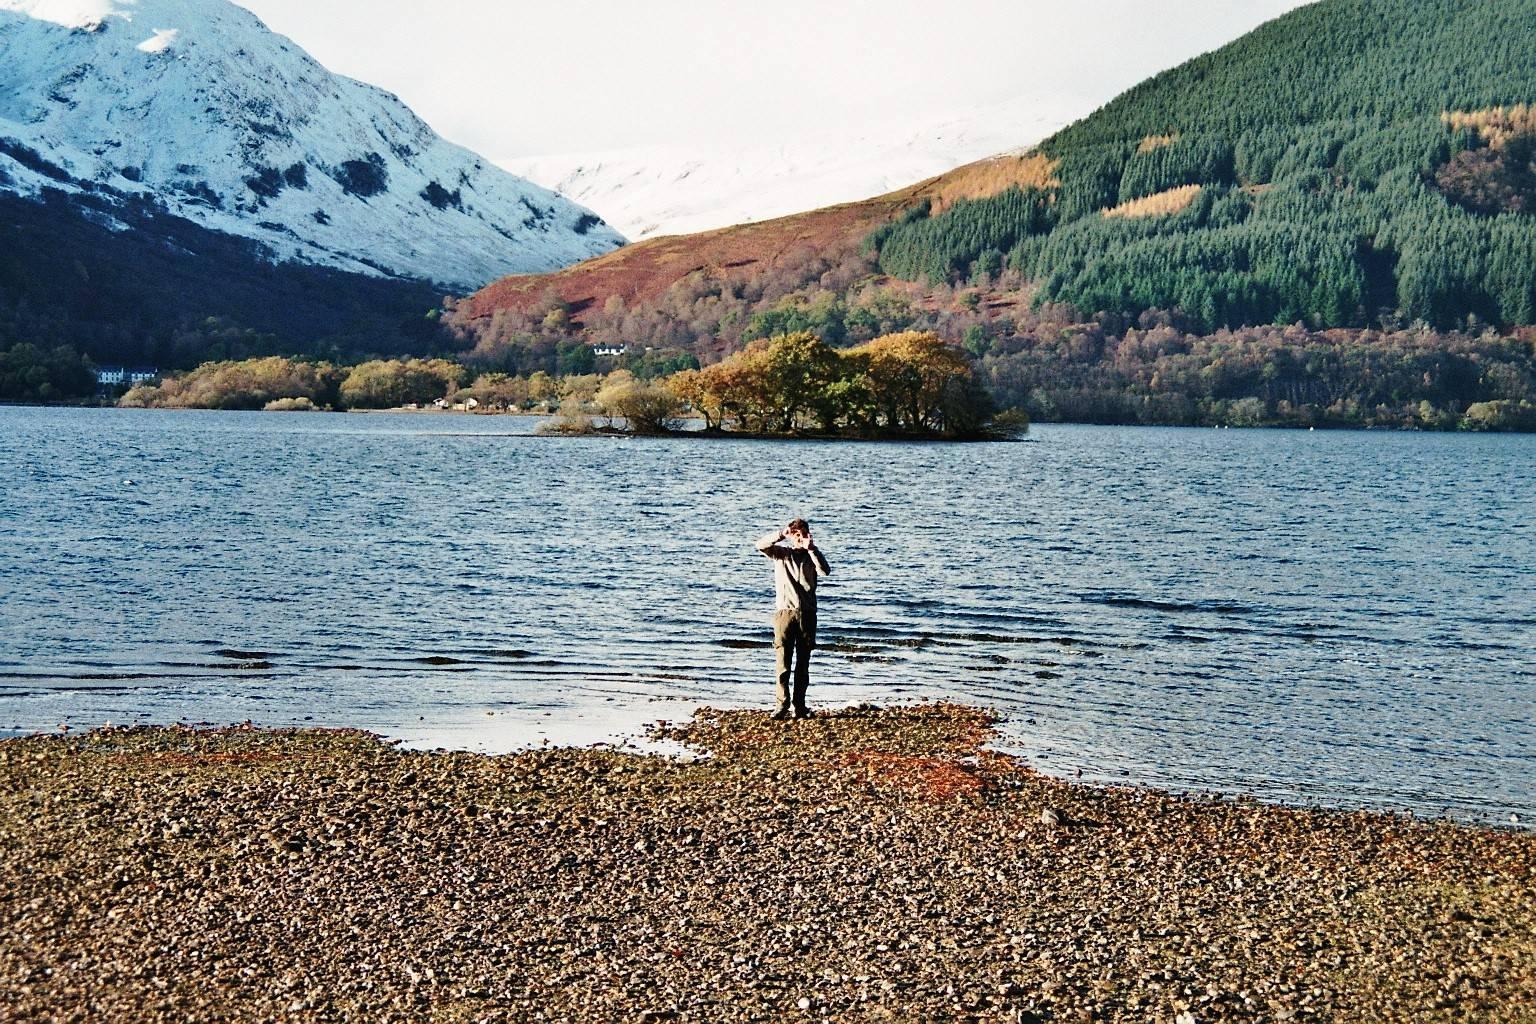 Photo 1: Loch Lomond